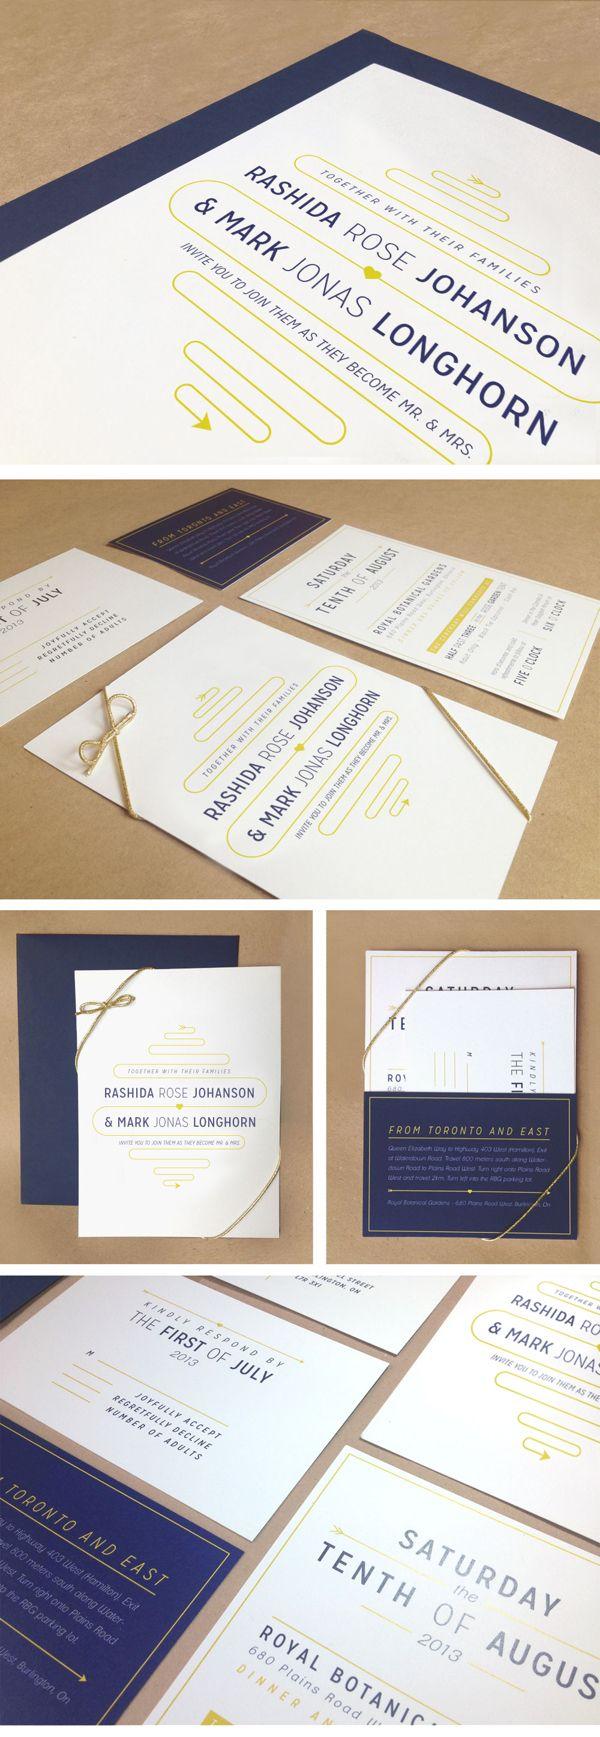 Wedding Invitation Design by Sabrina Smelko, via Behance | Wedding ...